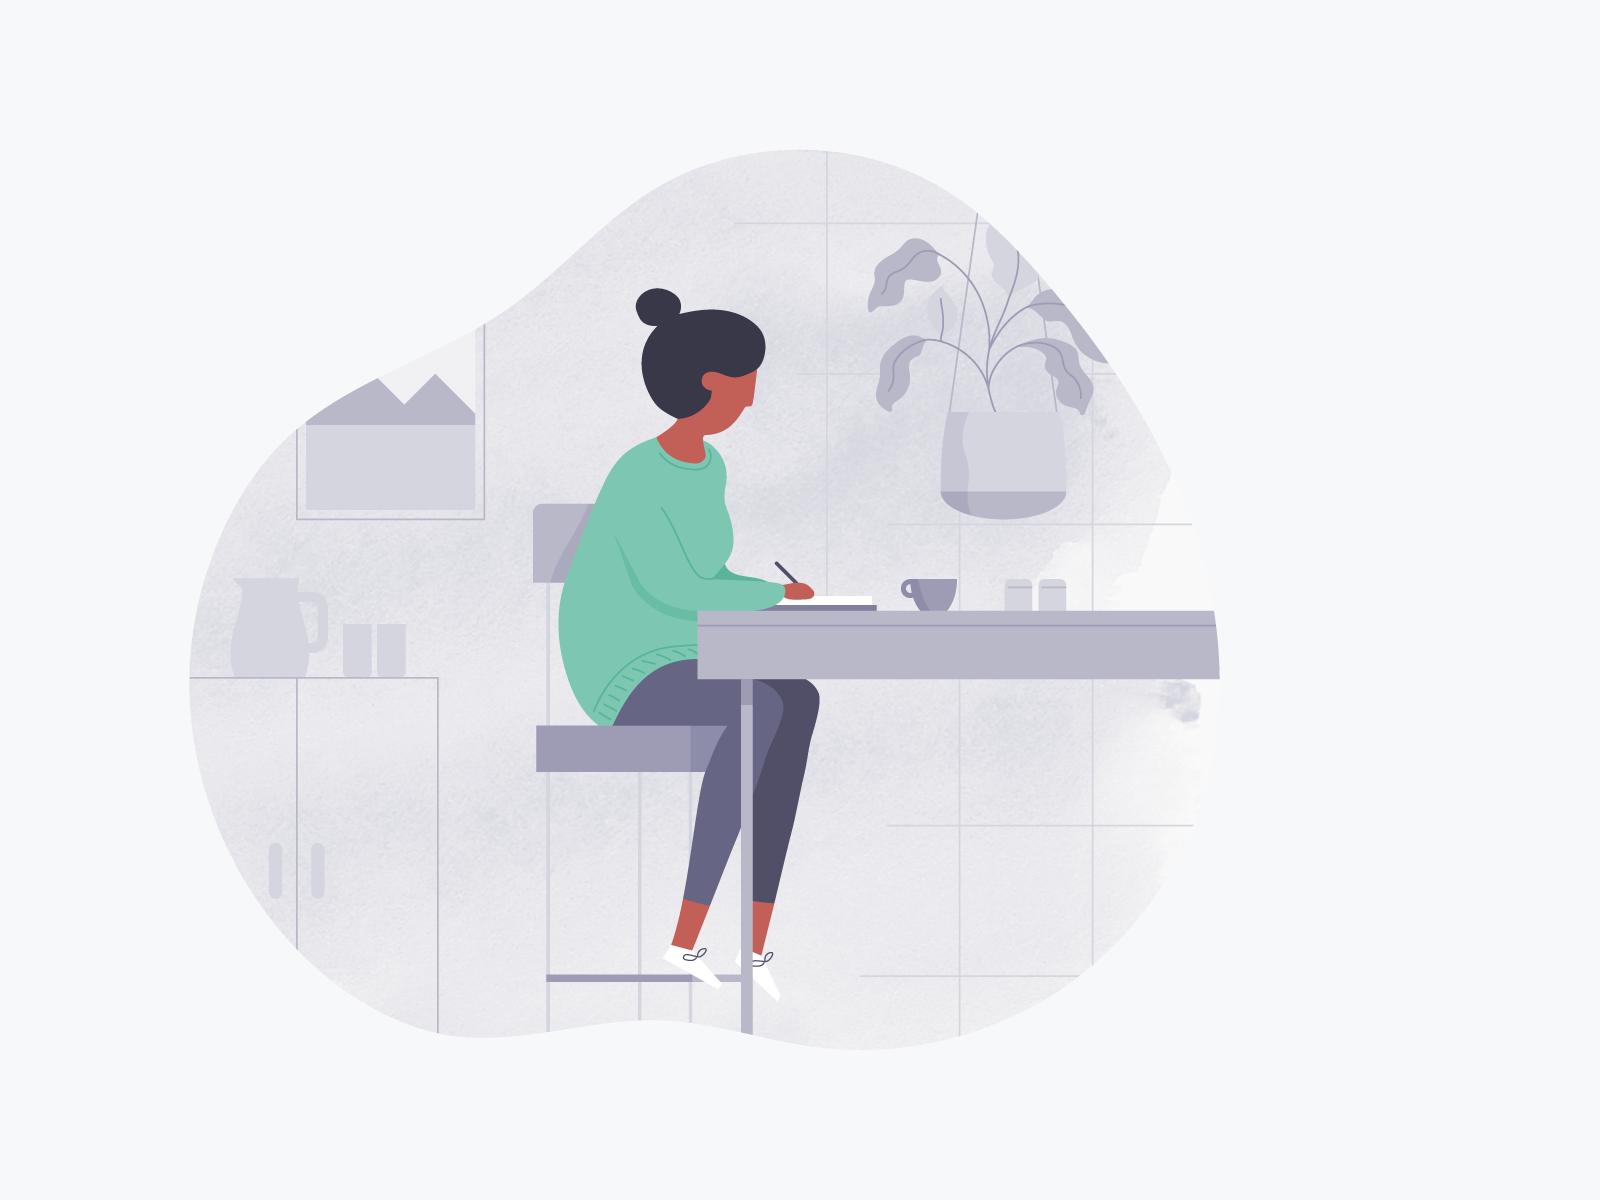 Starting freelance graphic design удаленная работа в обнинске